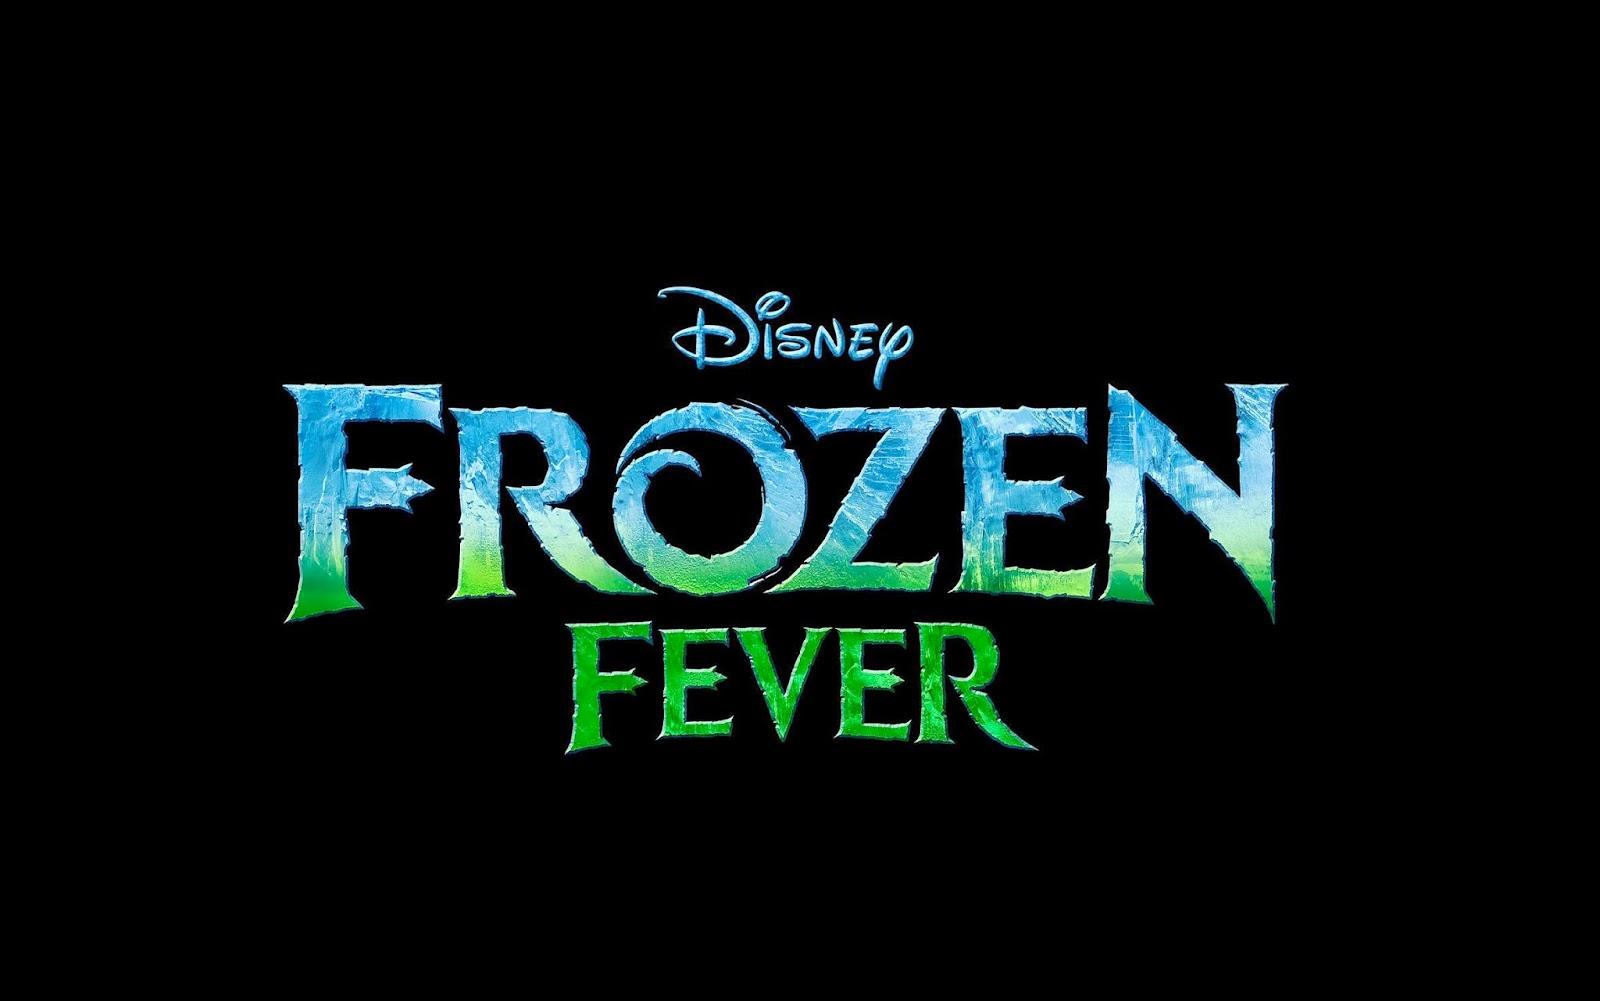 Frozen fever wallpaper hd gambar lucu terbaru cartoon - Fever wallpaper hd ...